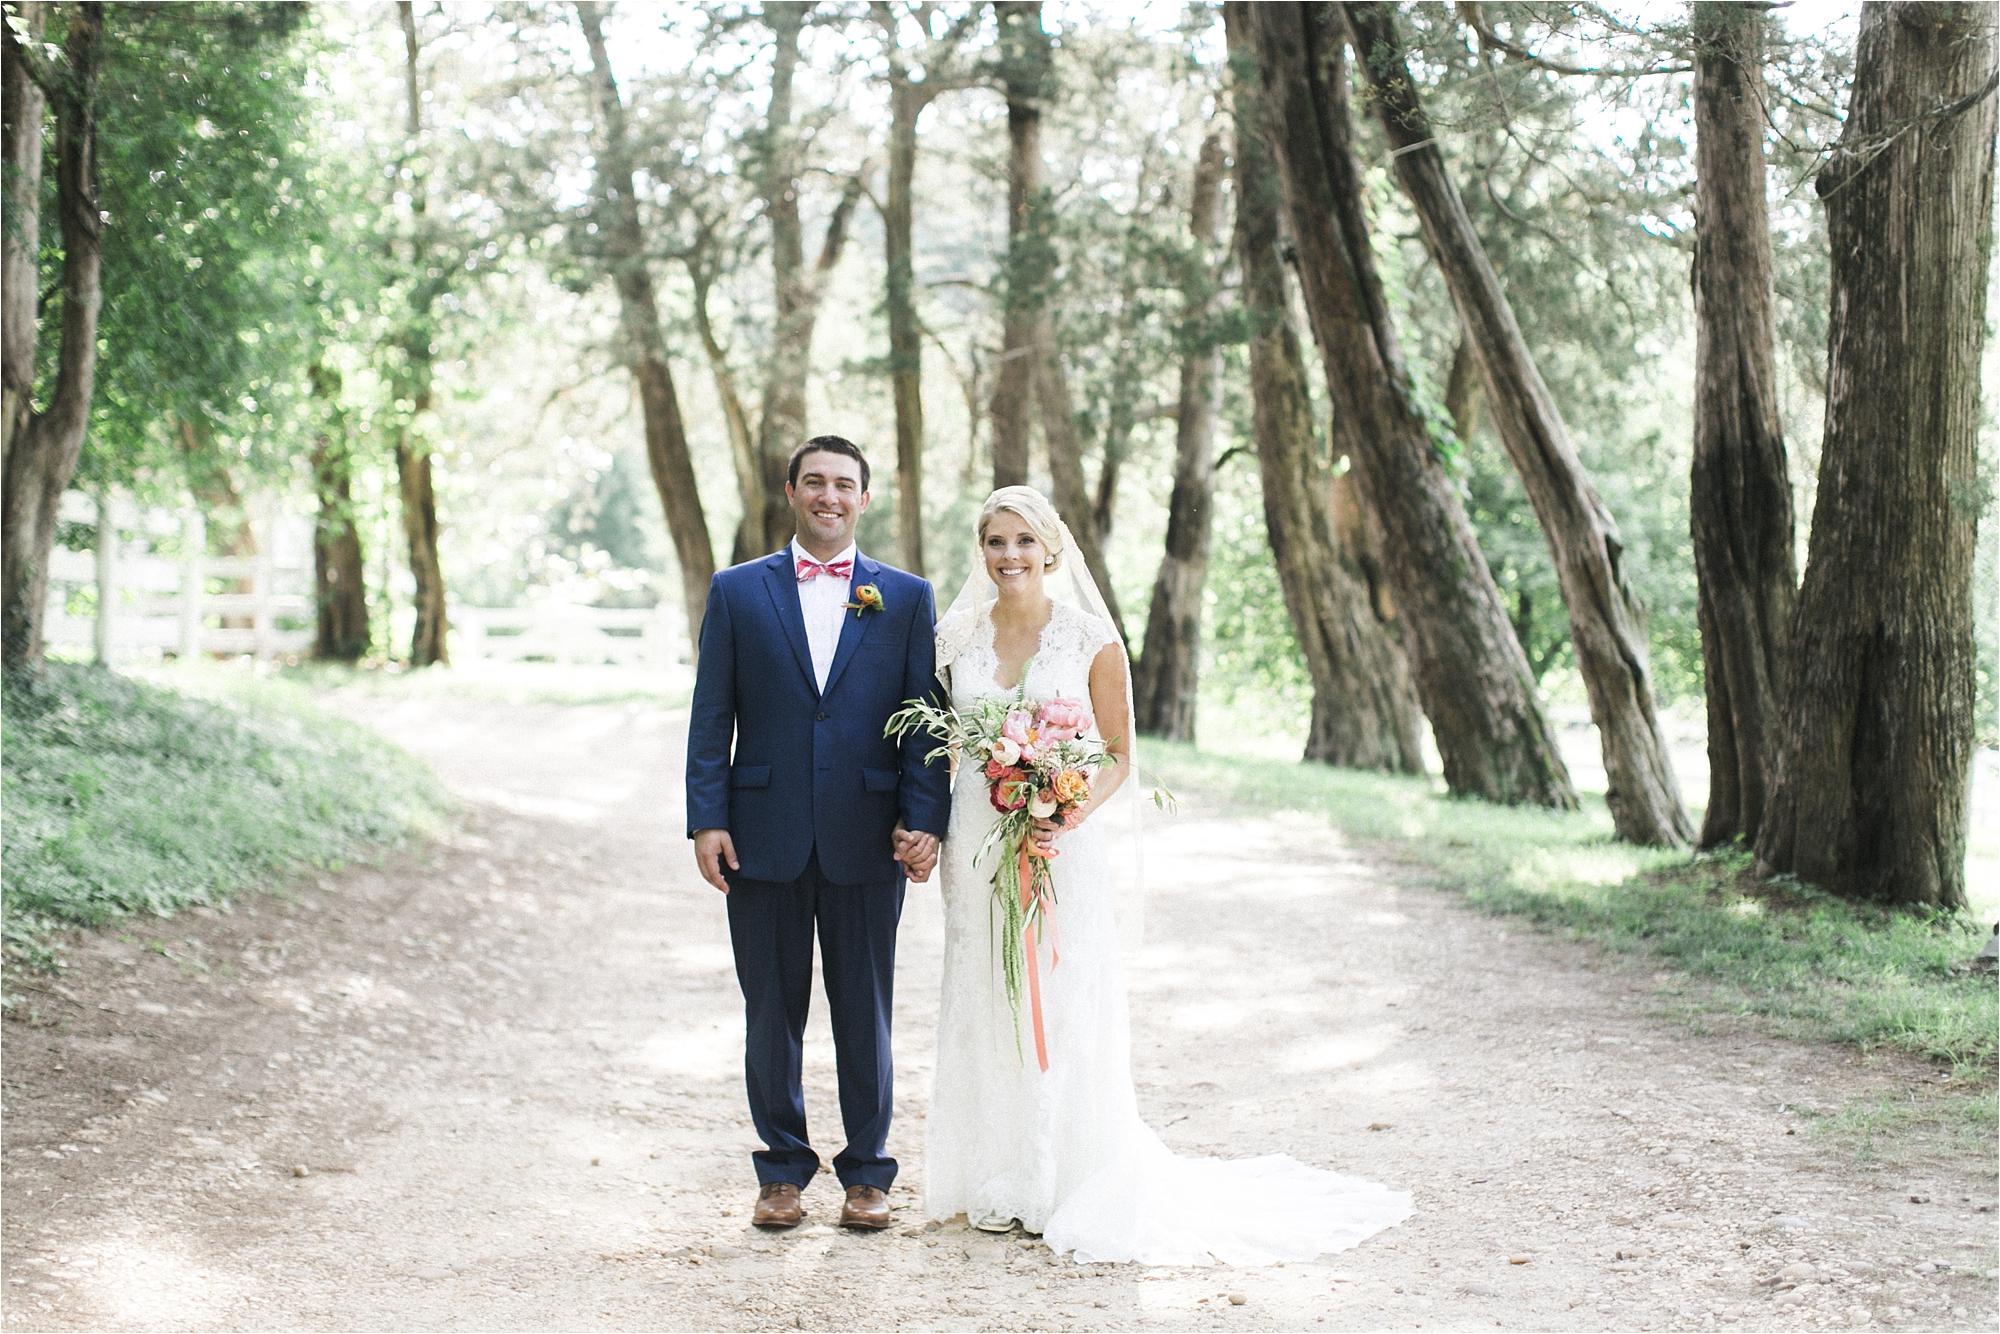 richmond-virginia-tuckahoe-plantation-coral-summer-wedding-stephanie-yonce-photos_0021.jpg